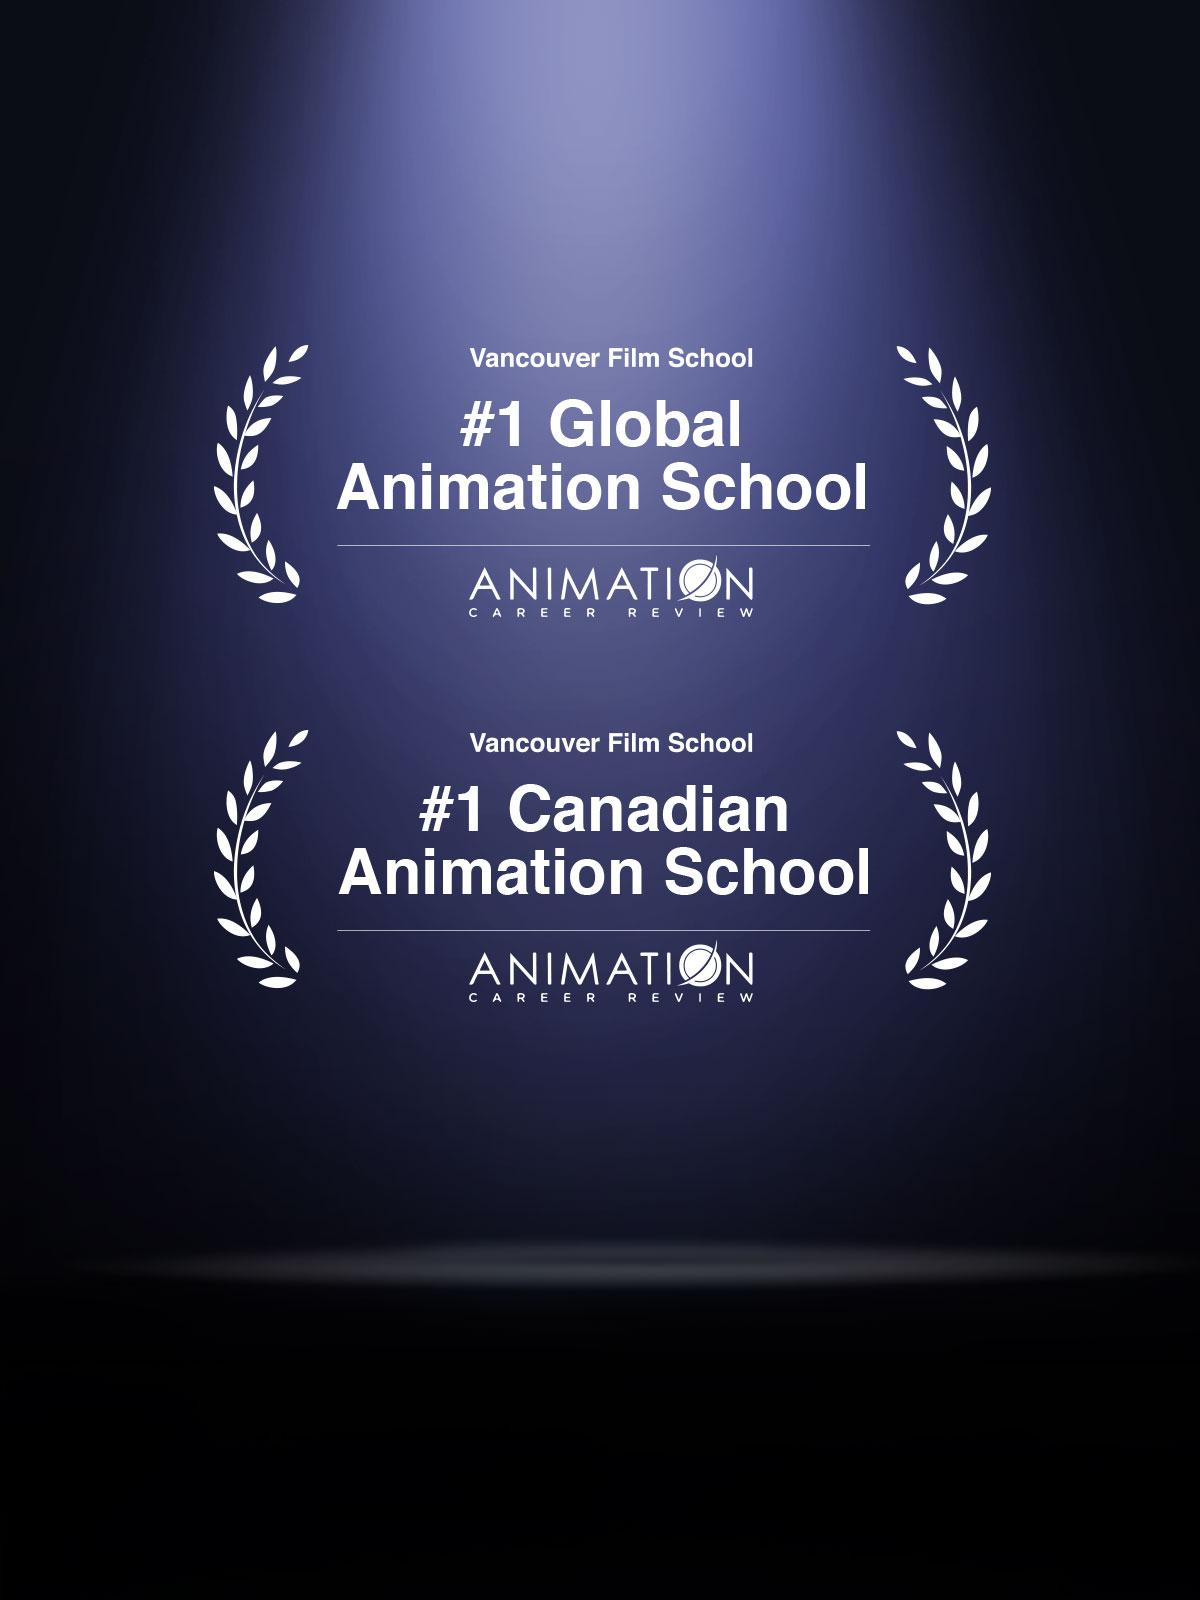 Vancouver Film School: Entertainment Arts Training For Film, TV